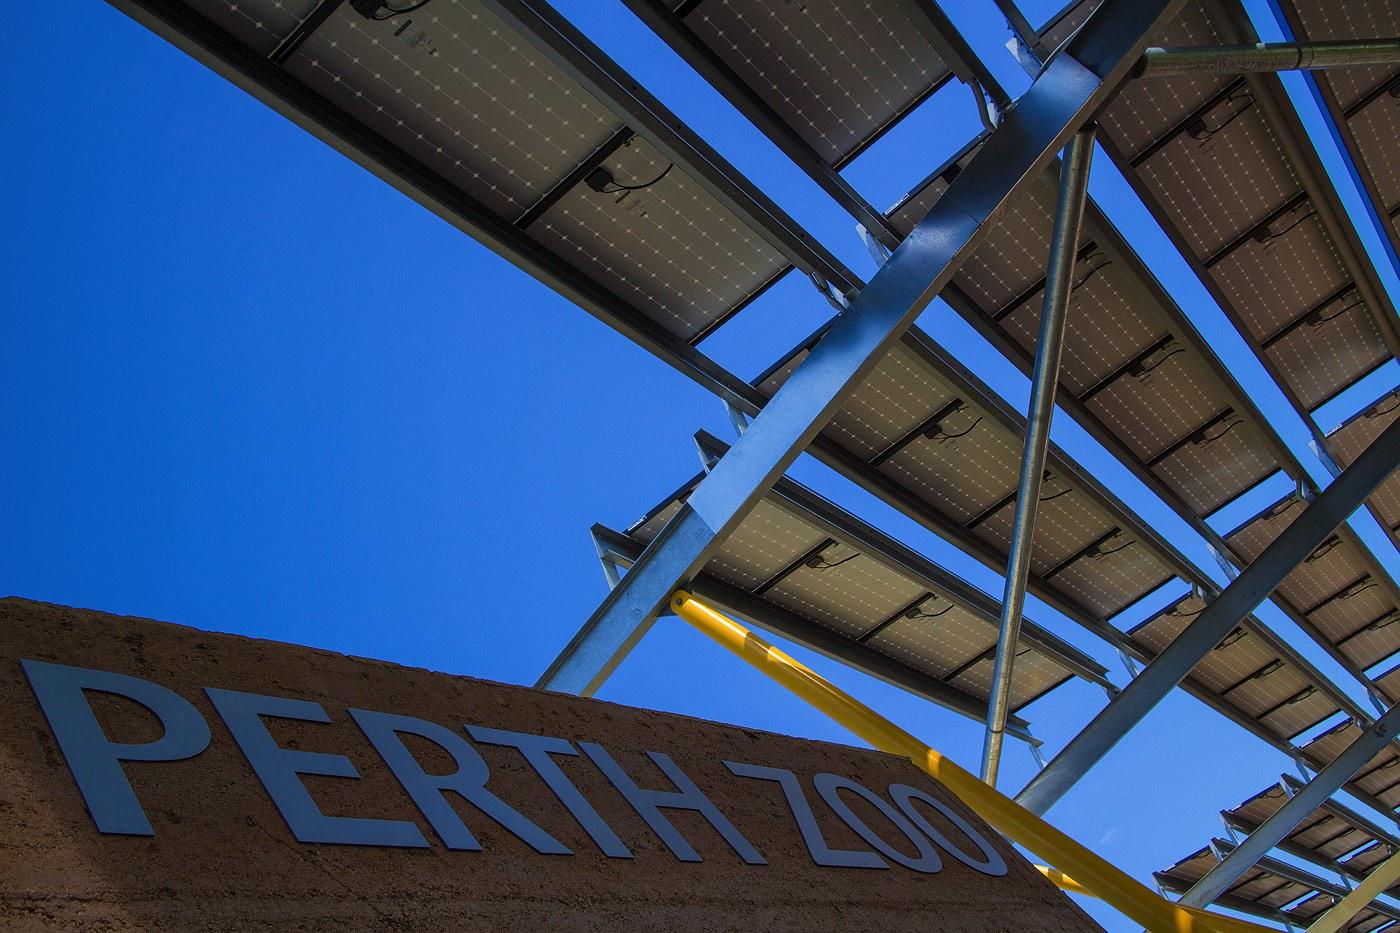 Perth Zoo Solar Panel Shades